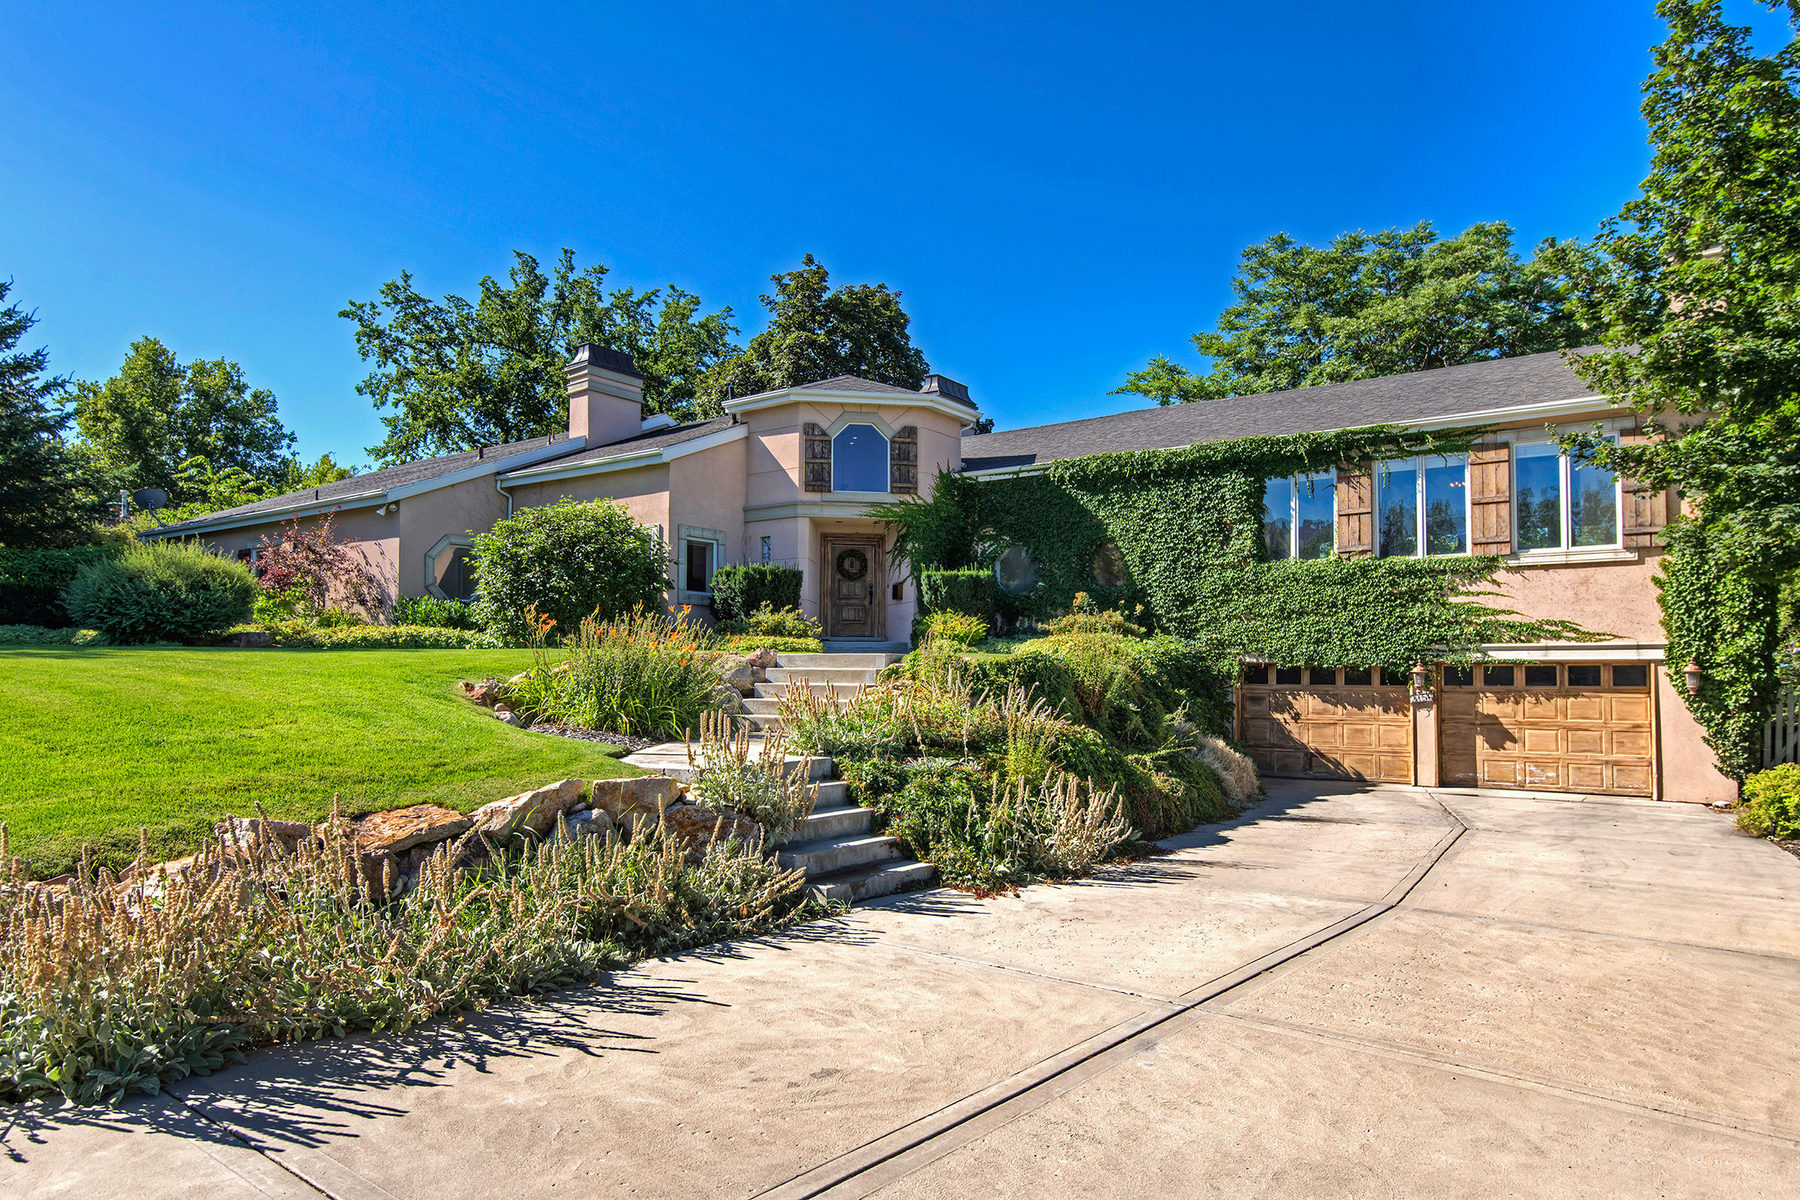 Villa per Vendita alle ore Elegant Country Club Estate 2156 Parleys Terr Salt Lake City, Utah 84109 Stati Uniti